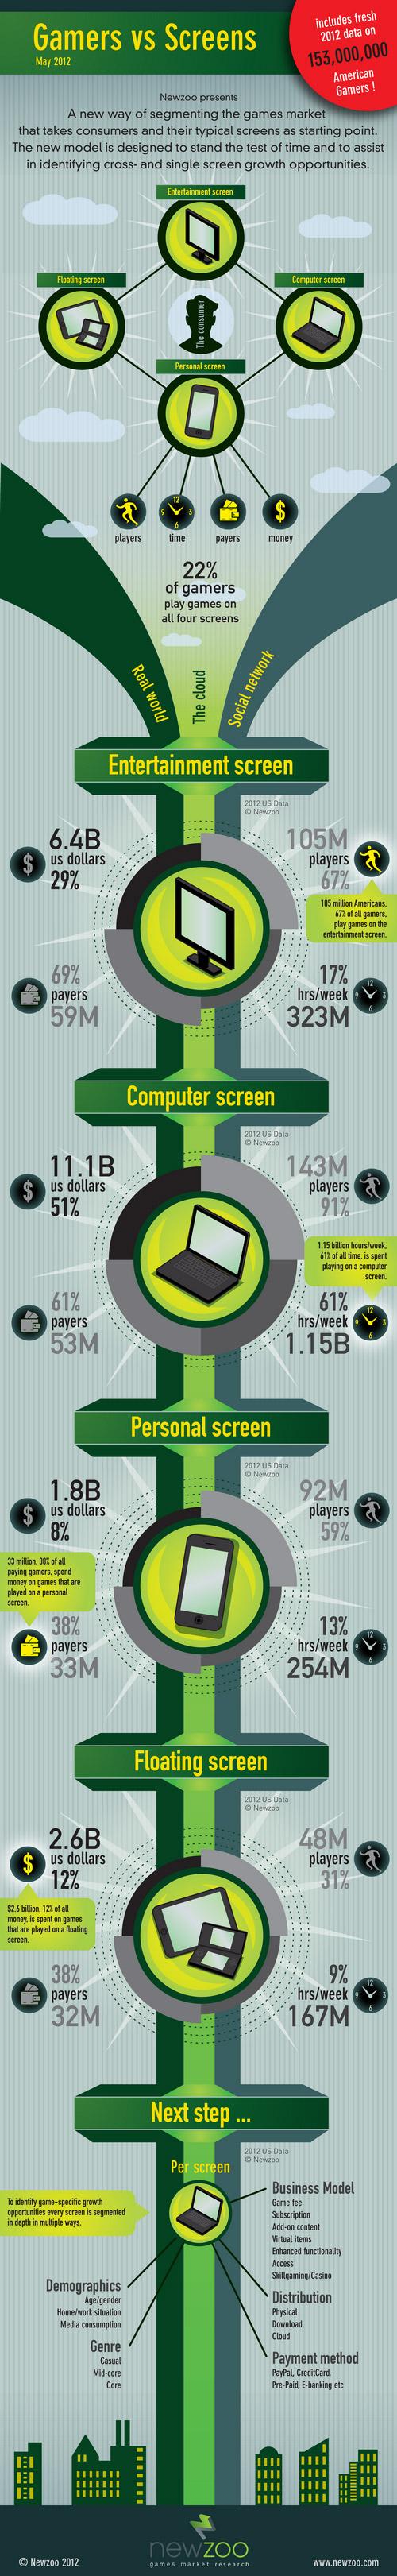 newzoo_gamers_vs_screens_inforgraphics_2012